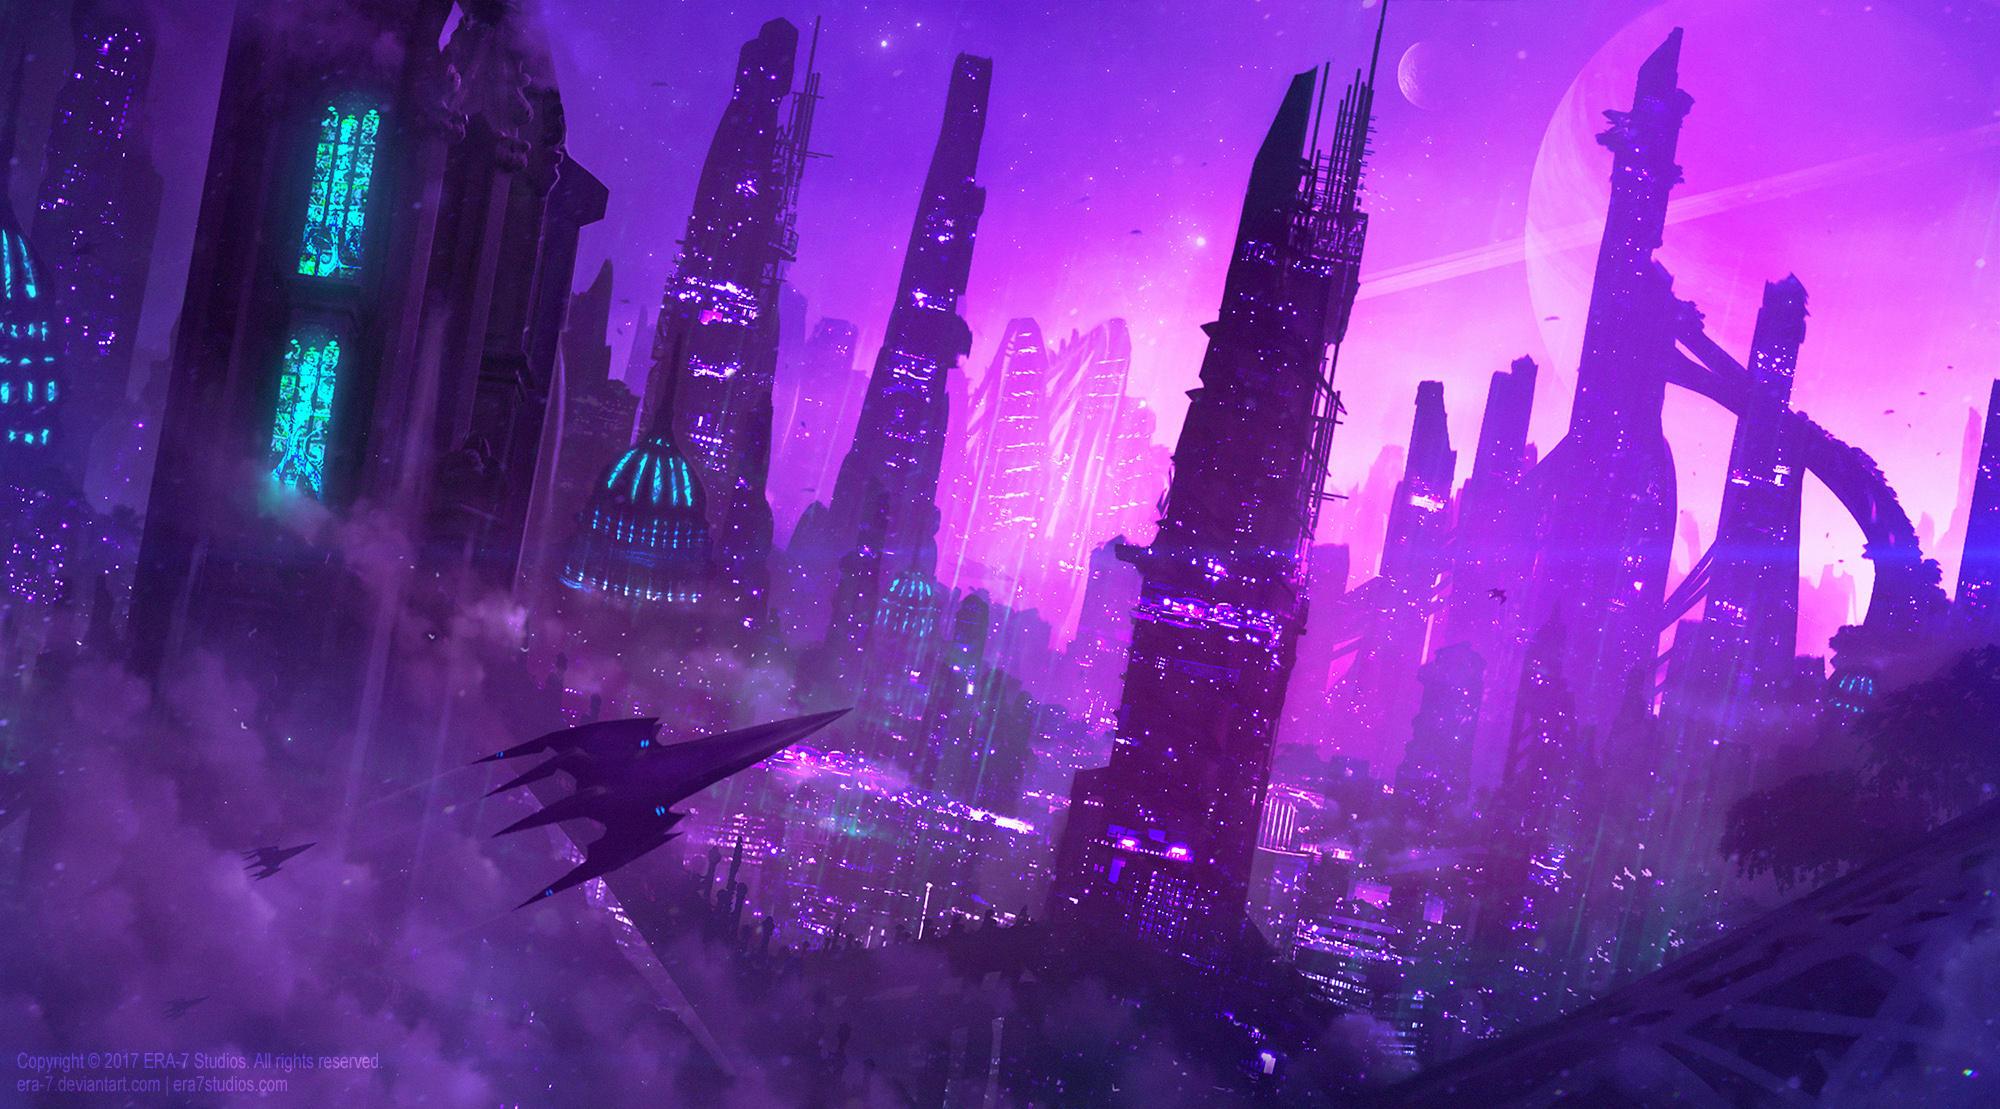 +City of the Amethyst Nights+ by ERA-7